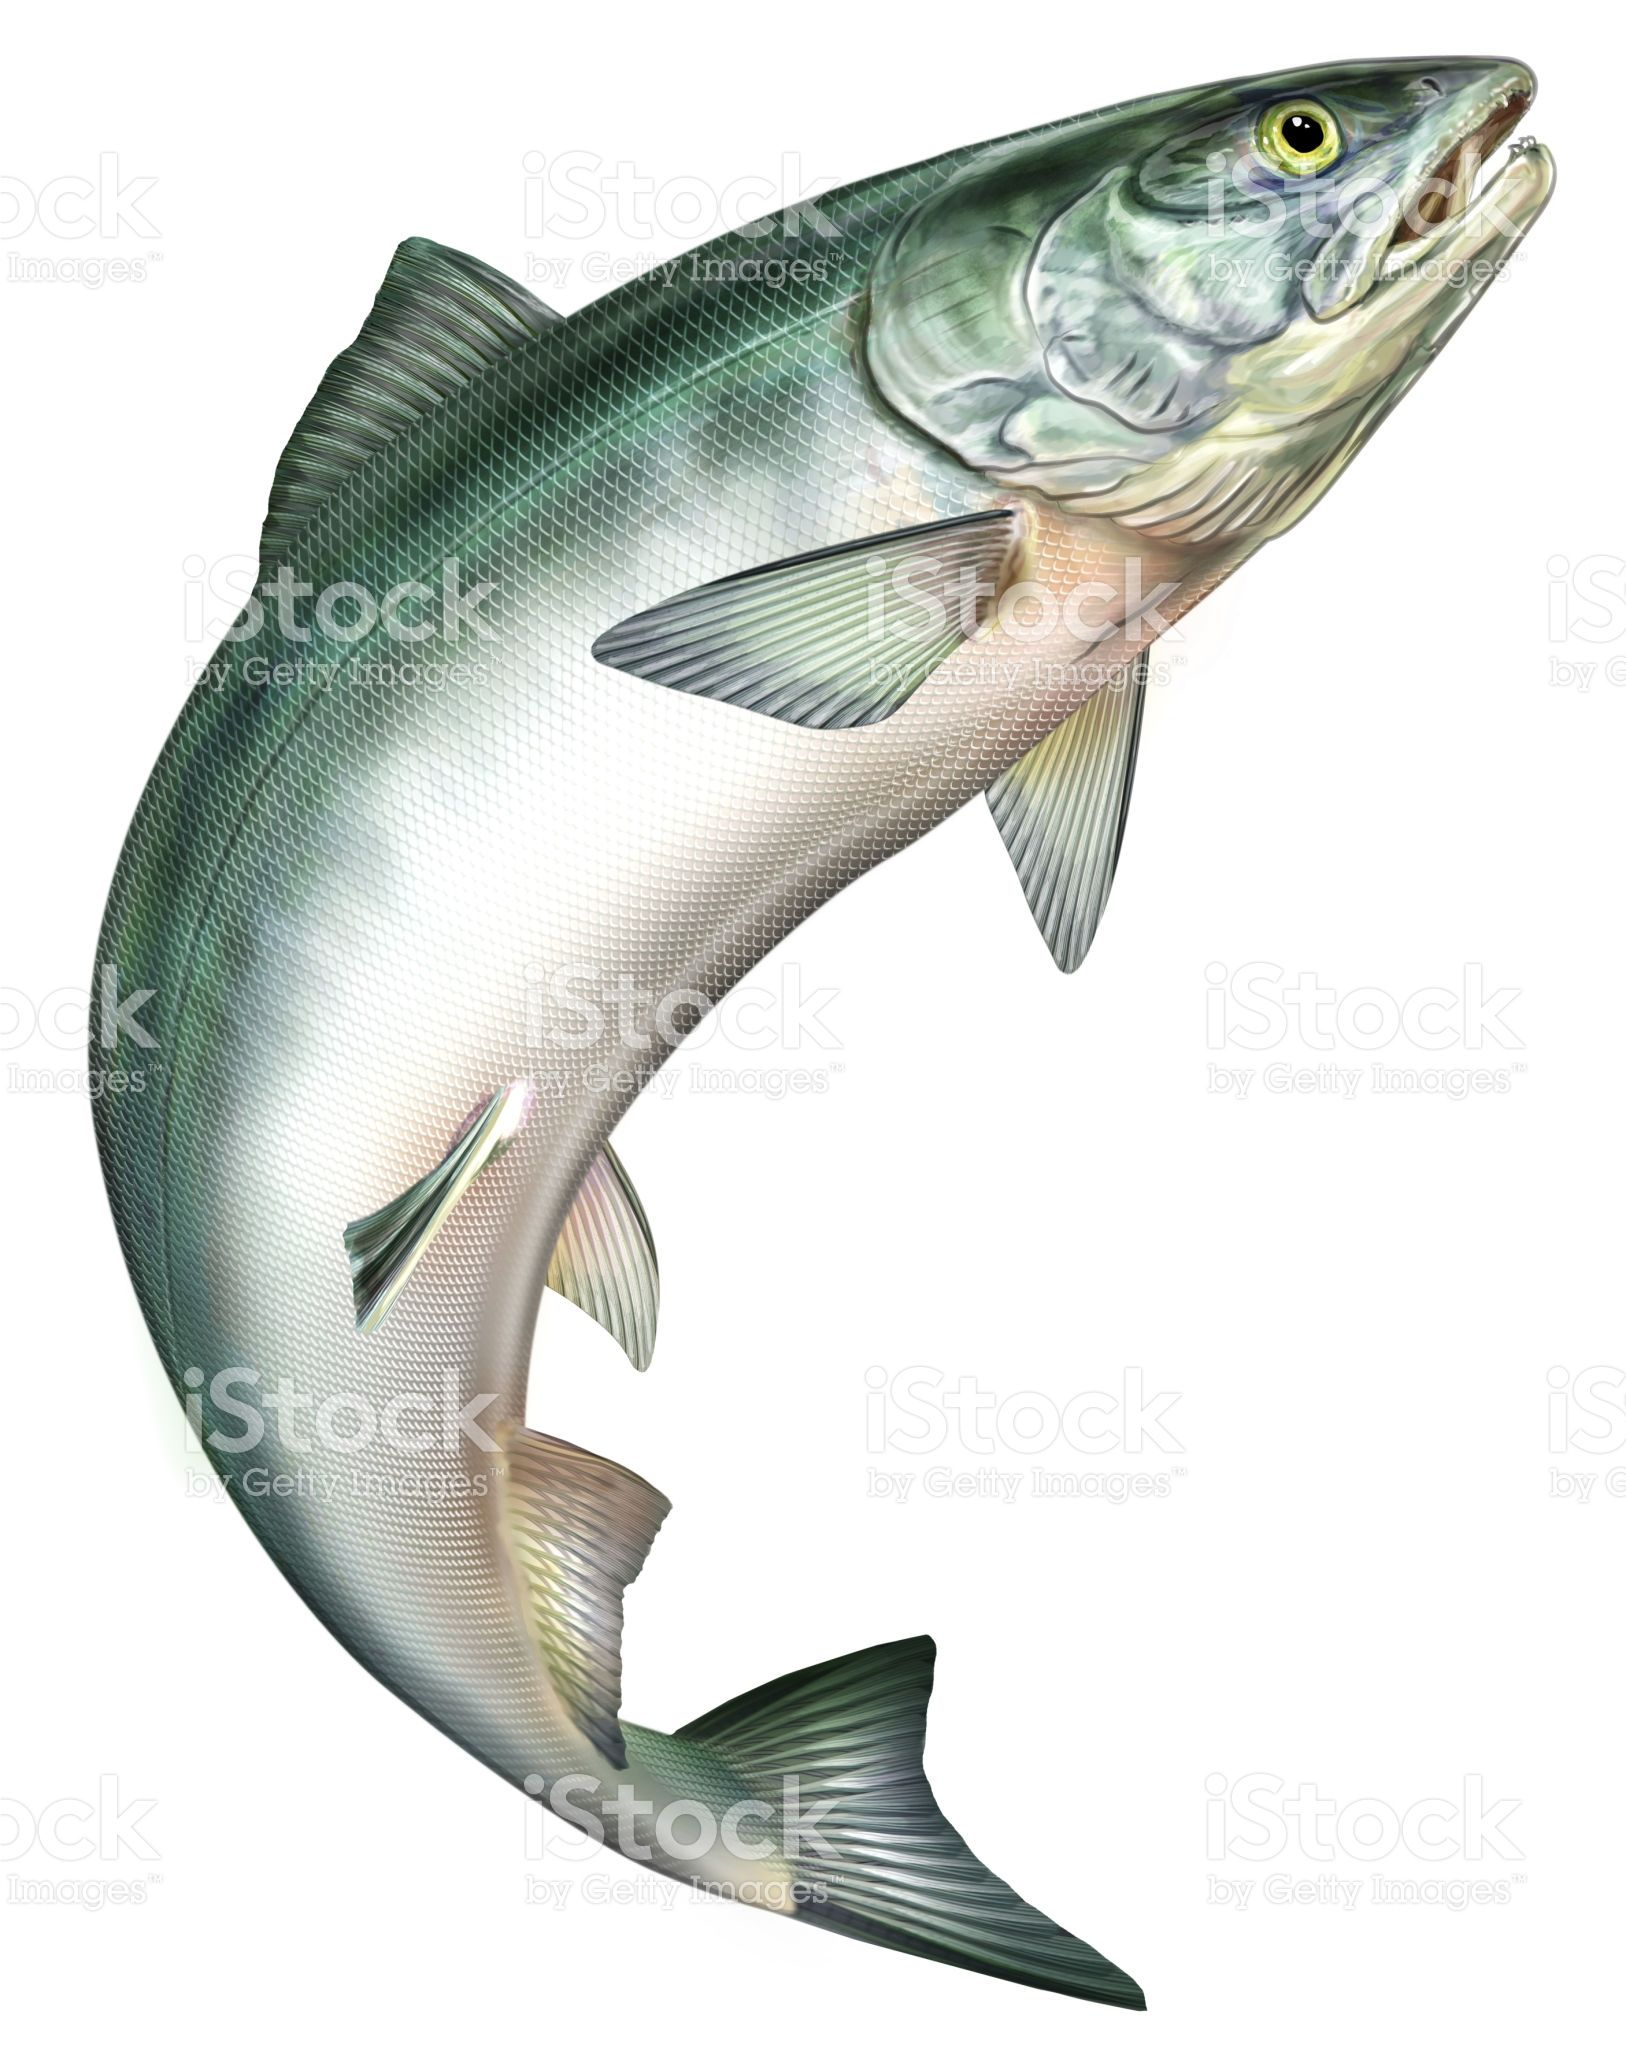 Salmon jumping.